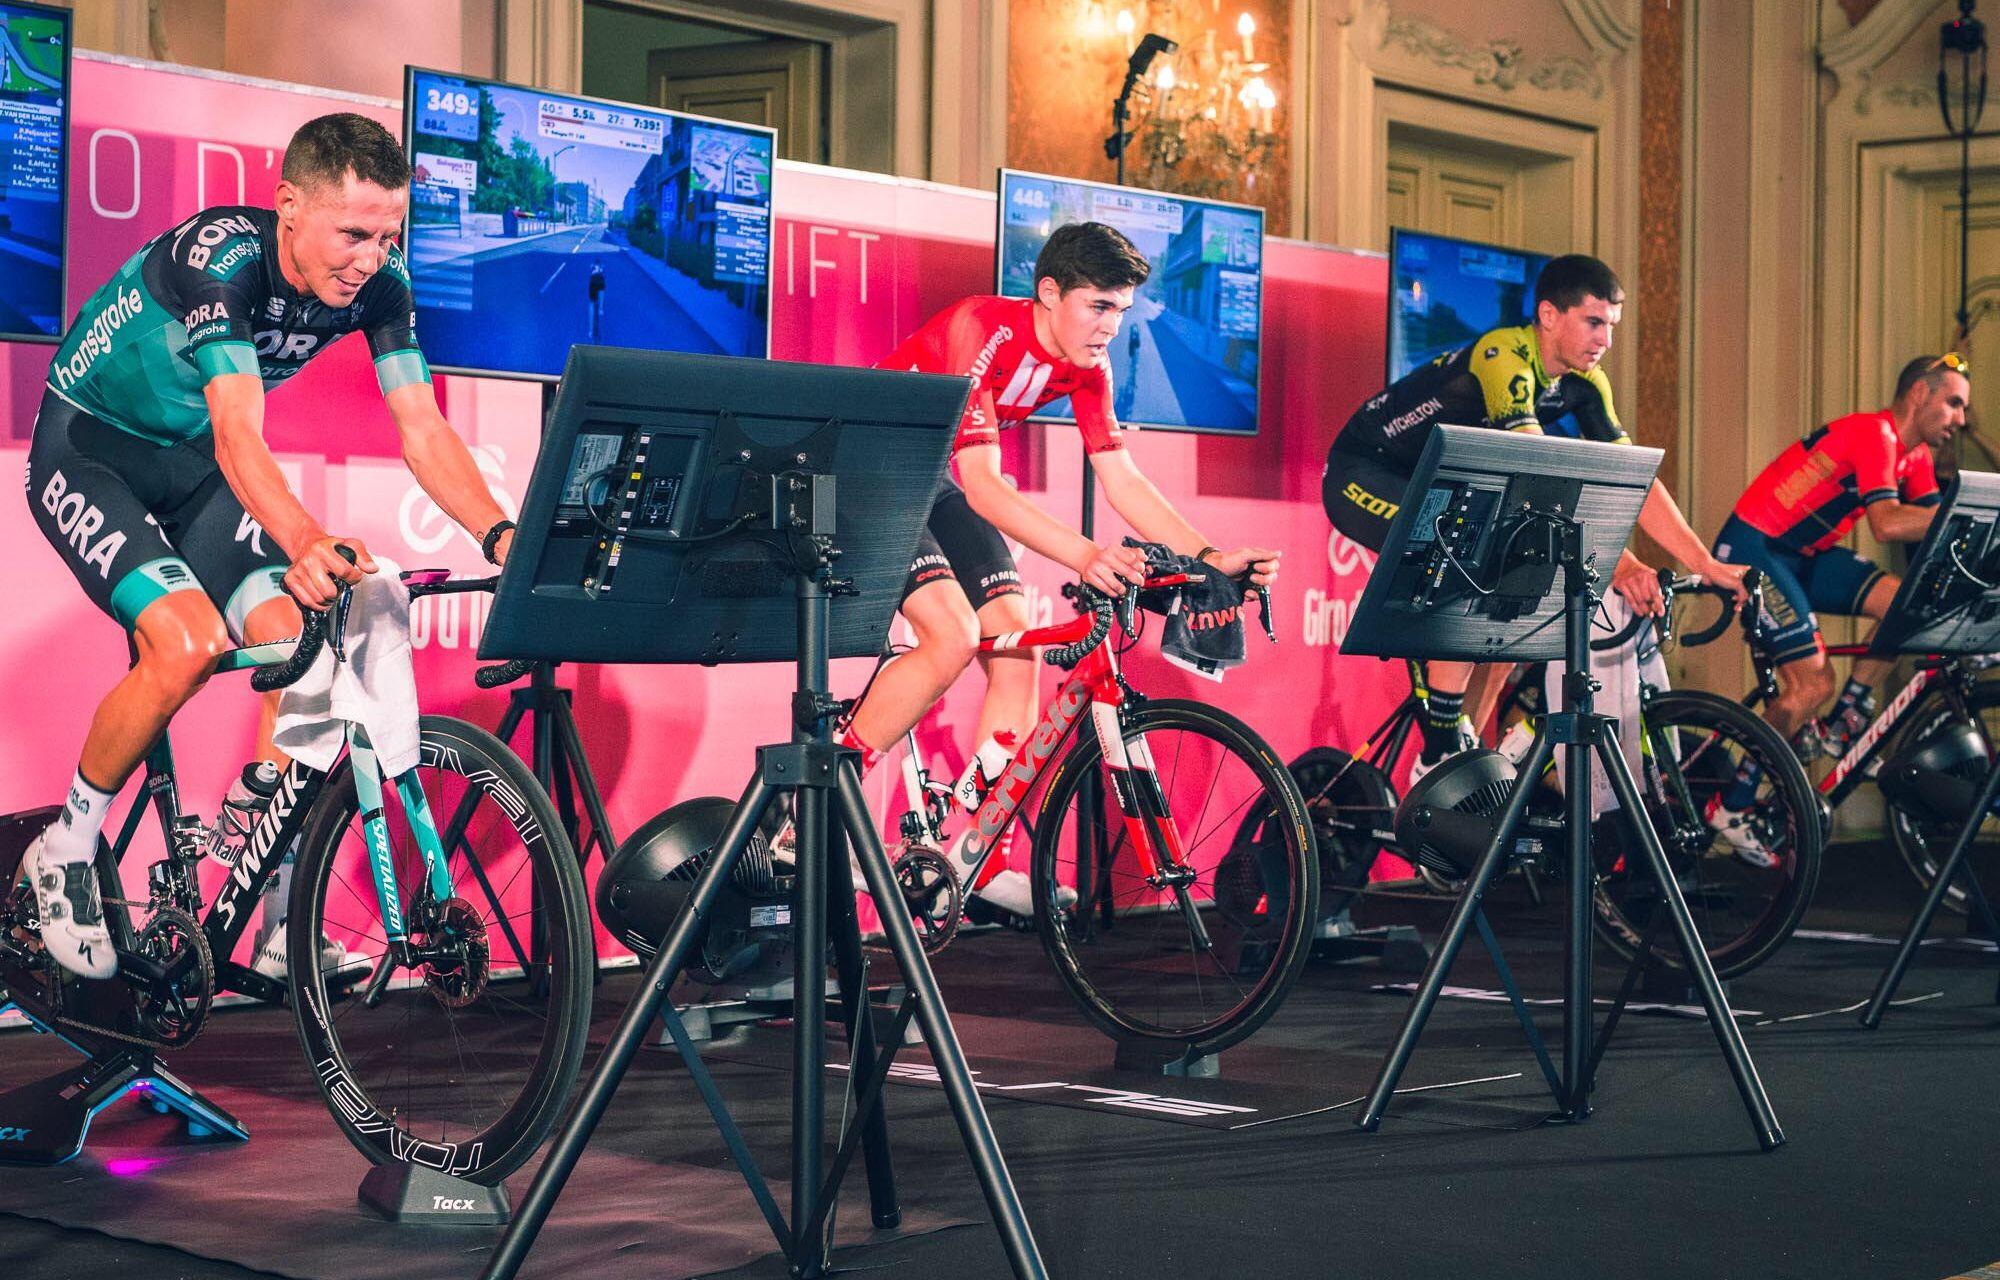 Zwift Recreates the Opening Stage of the 2019 Giro d'Italia